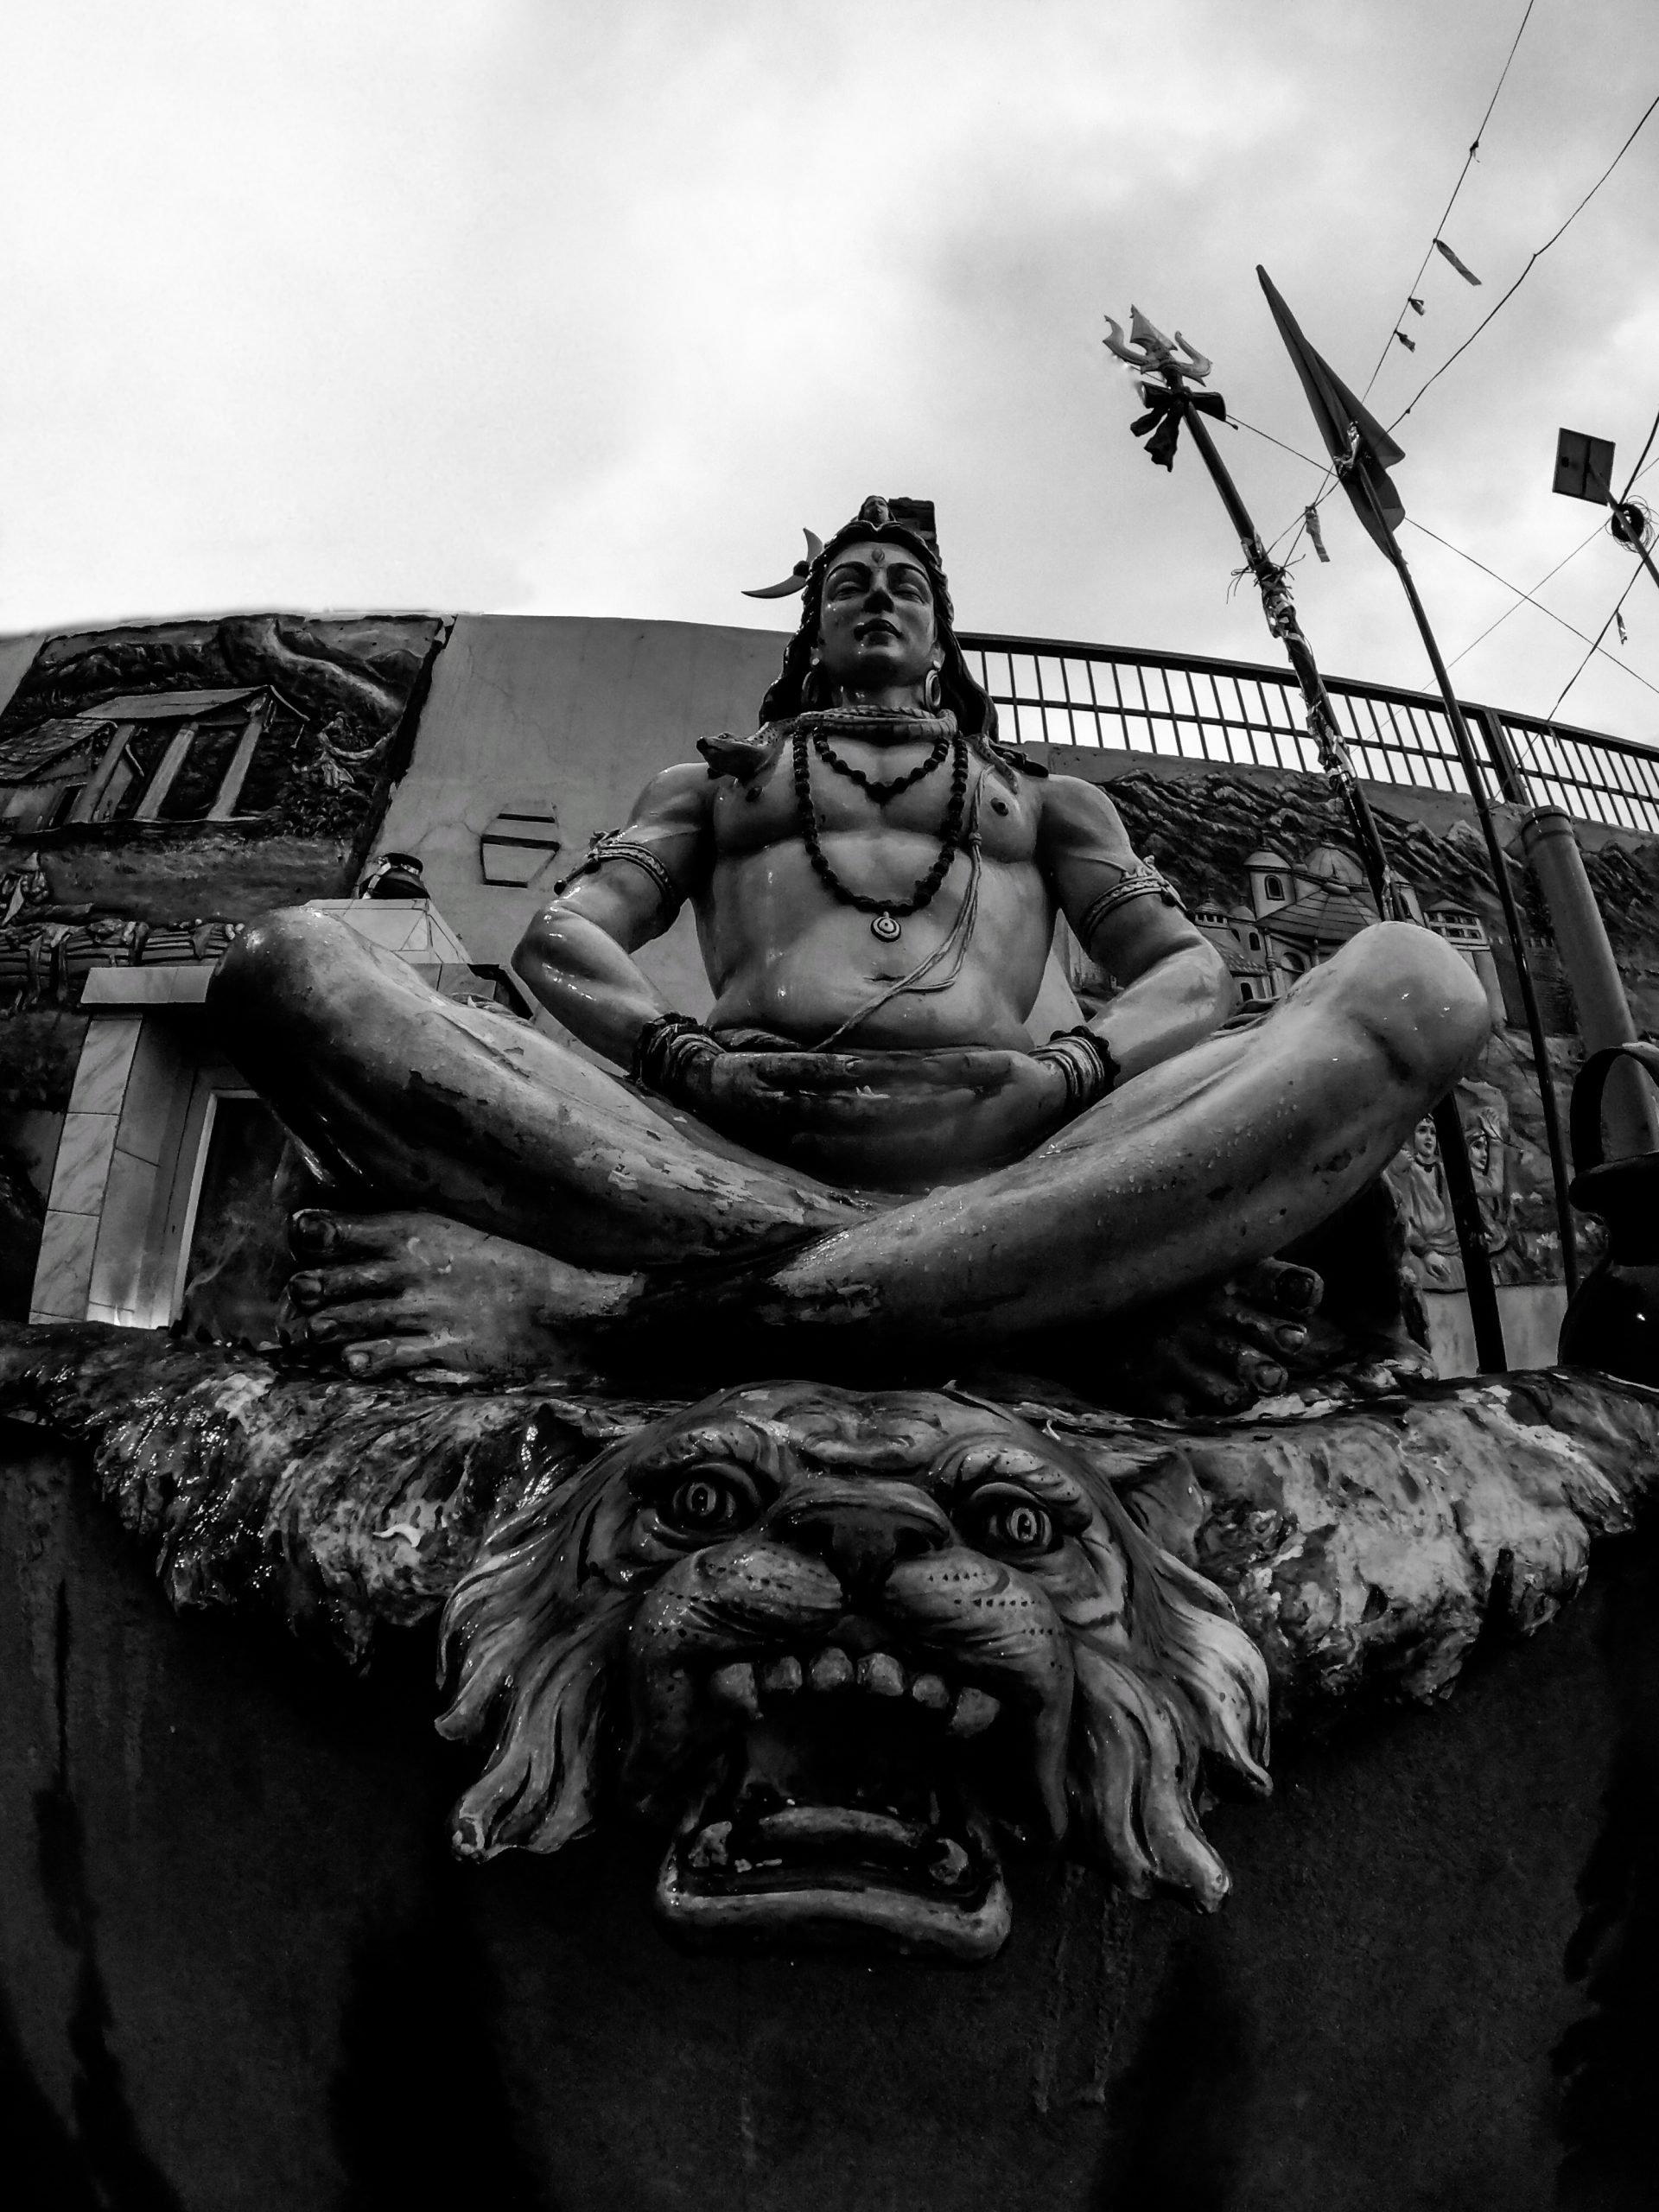 A big statue of Lord Shiva